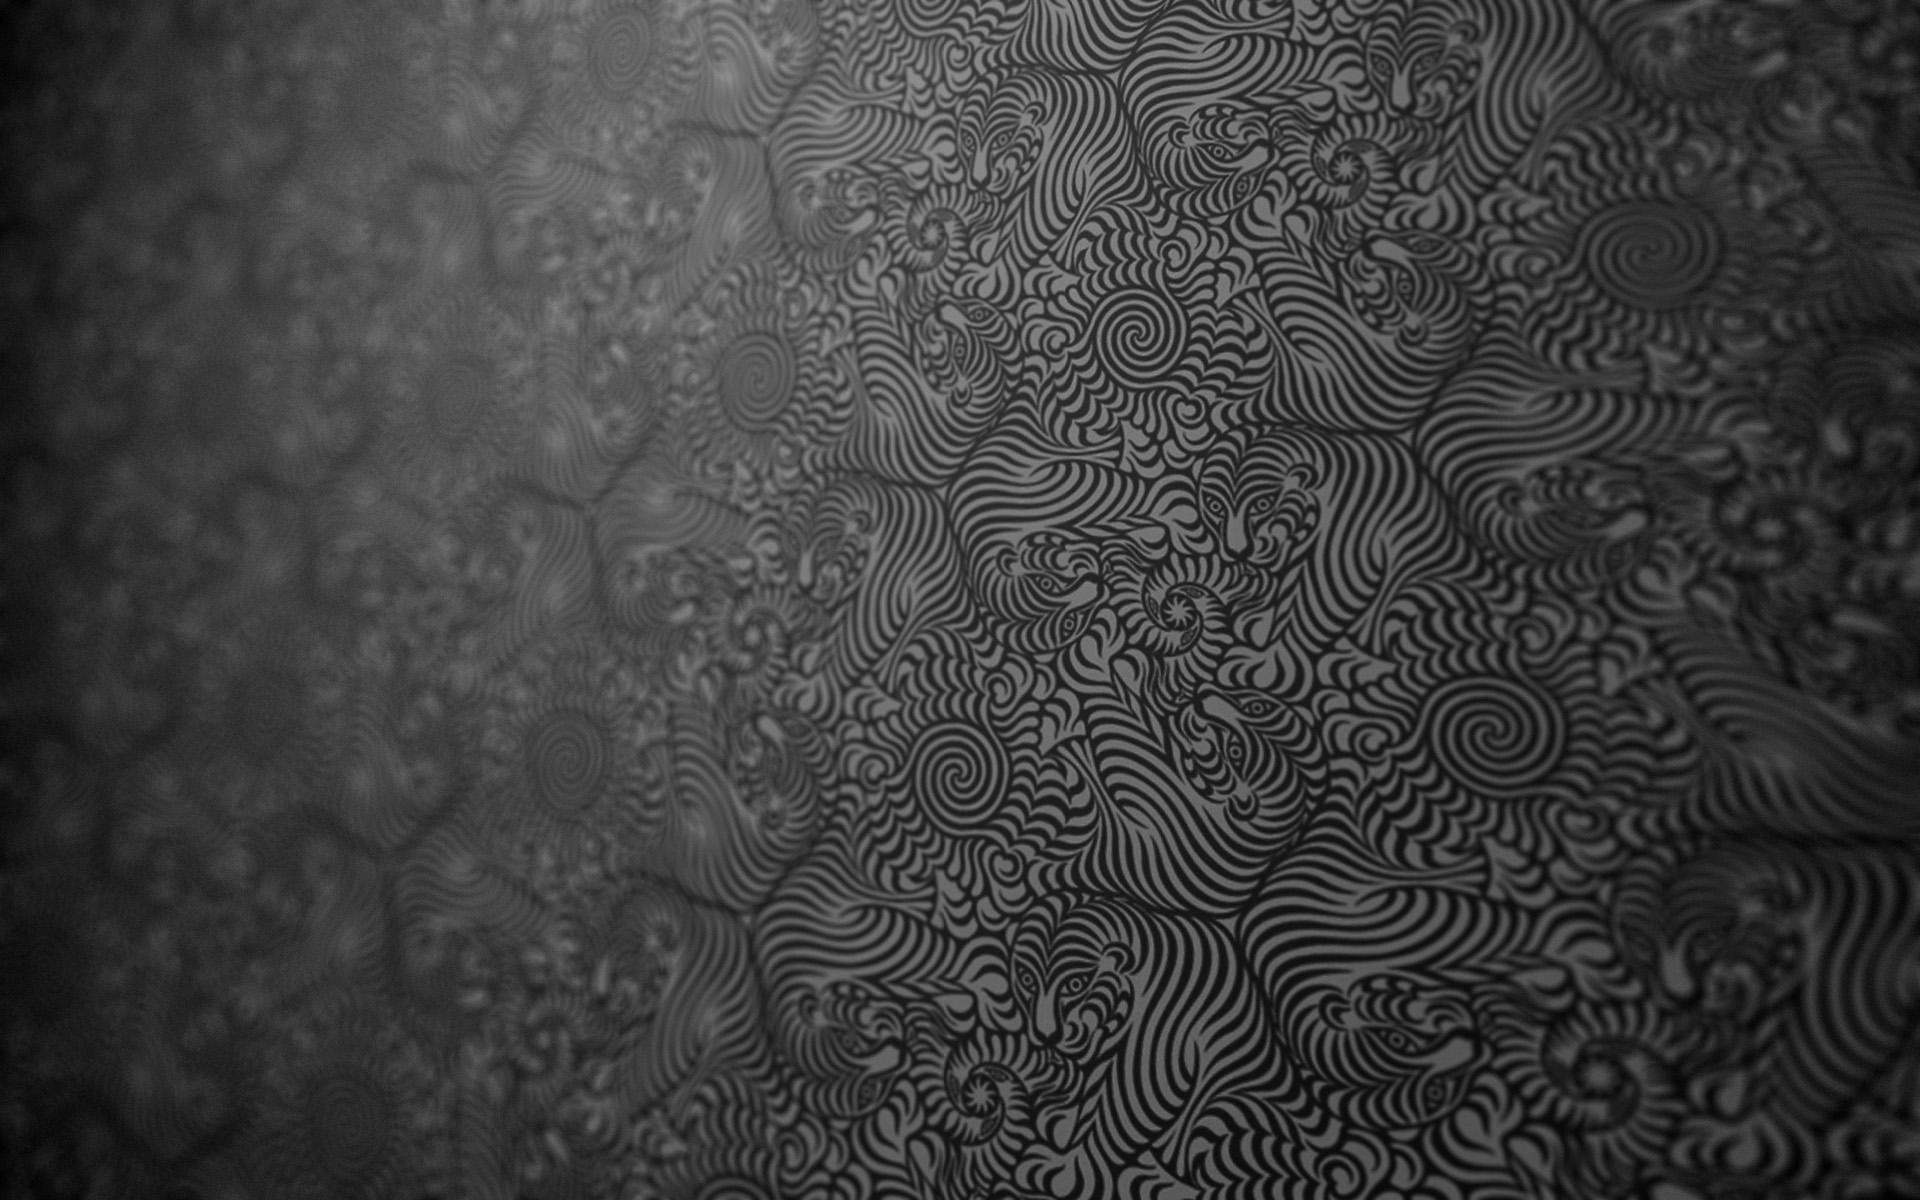 General 1920x1200 tiger abstract pattern monochrome artwork digital art textured texture fractal tassellation